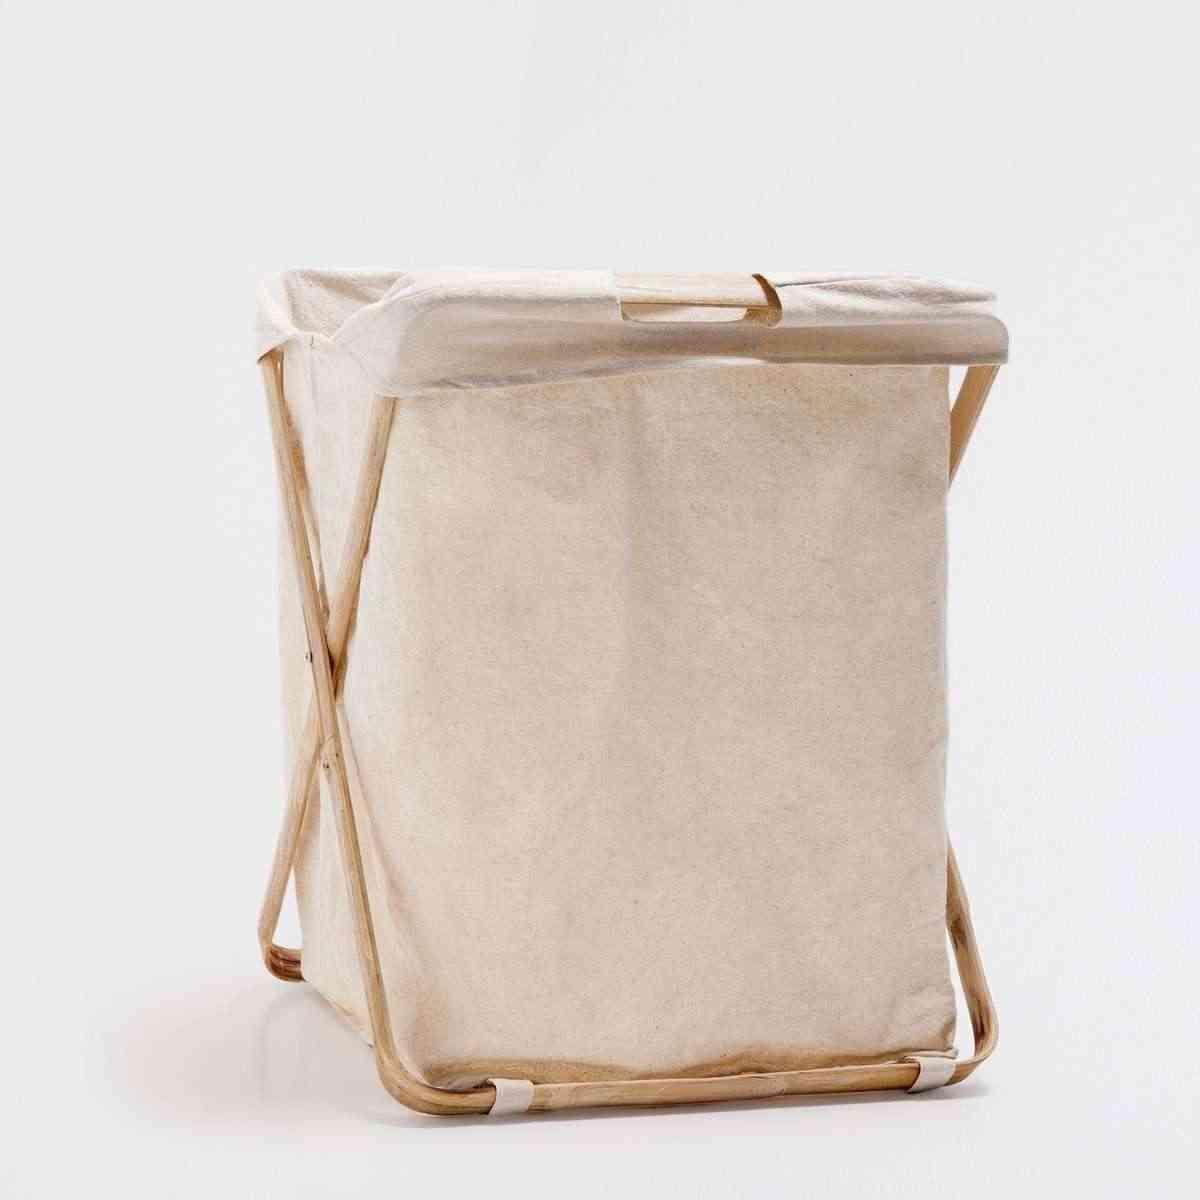 Mueble de madera para ropa sucia - Cestos de madera ...